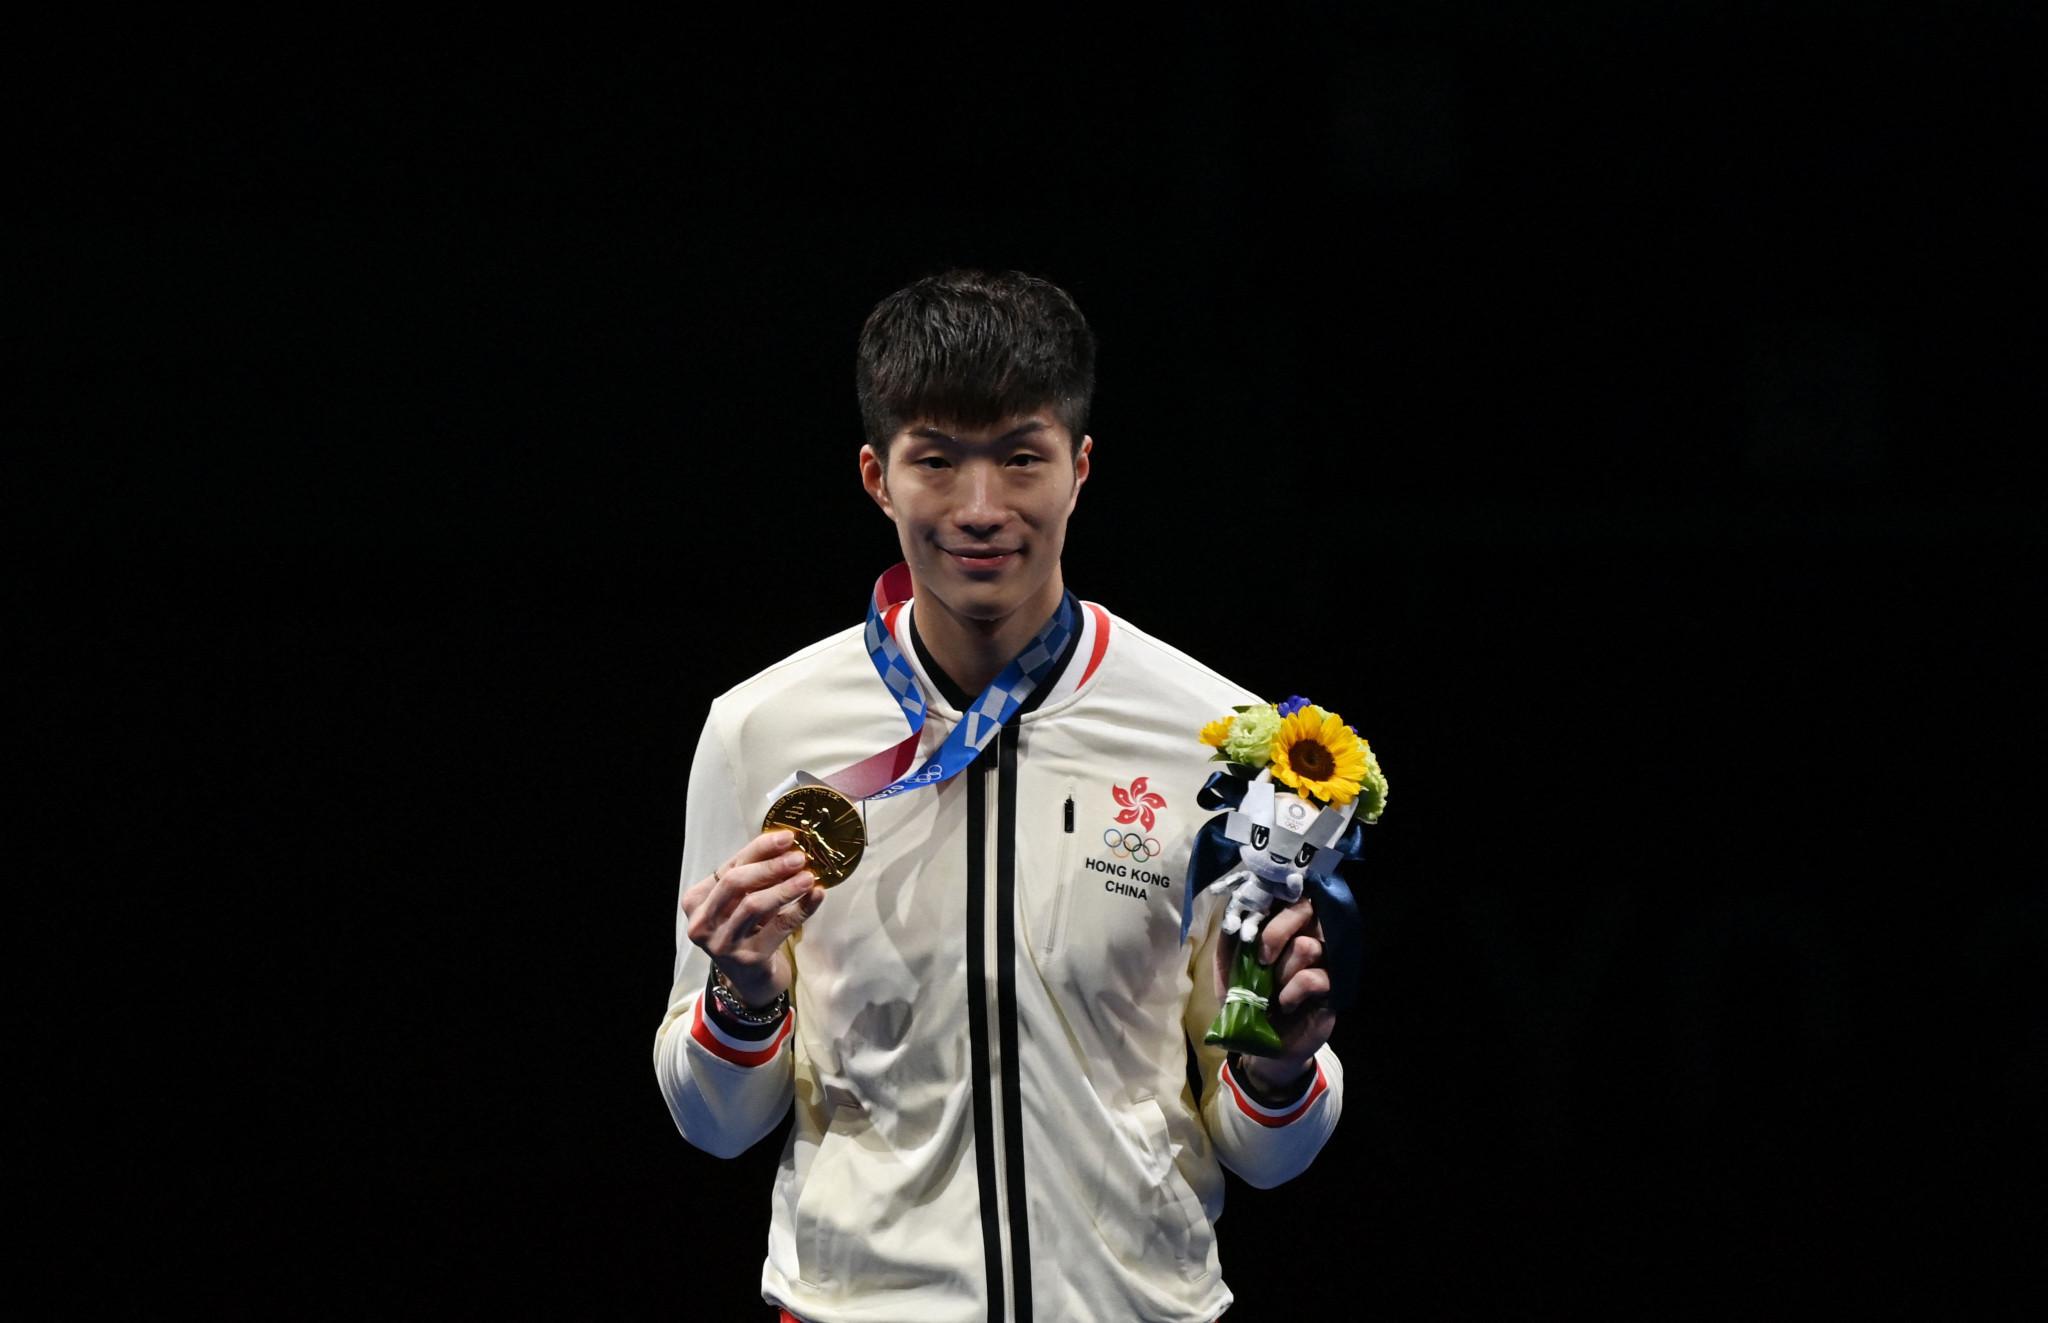 Cheung Ka Long upsets Daniel Garozzo to win Hong Kong's first fencing gold